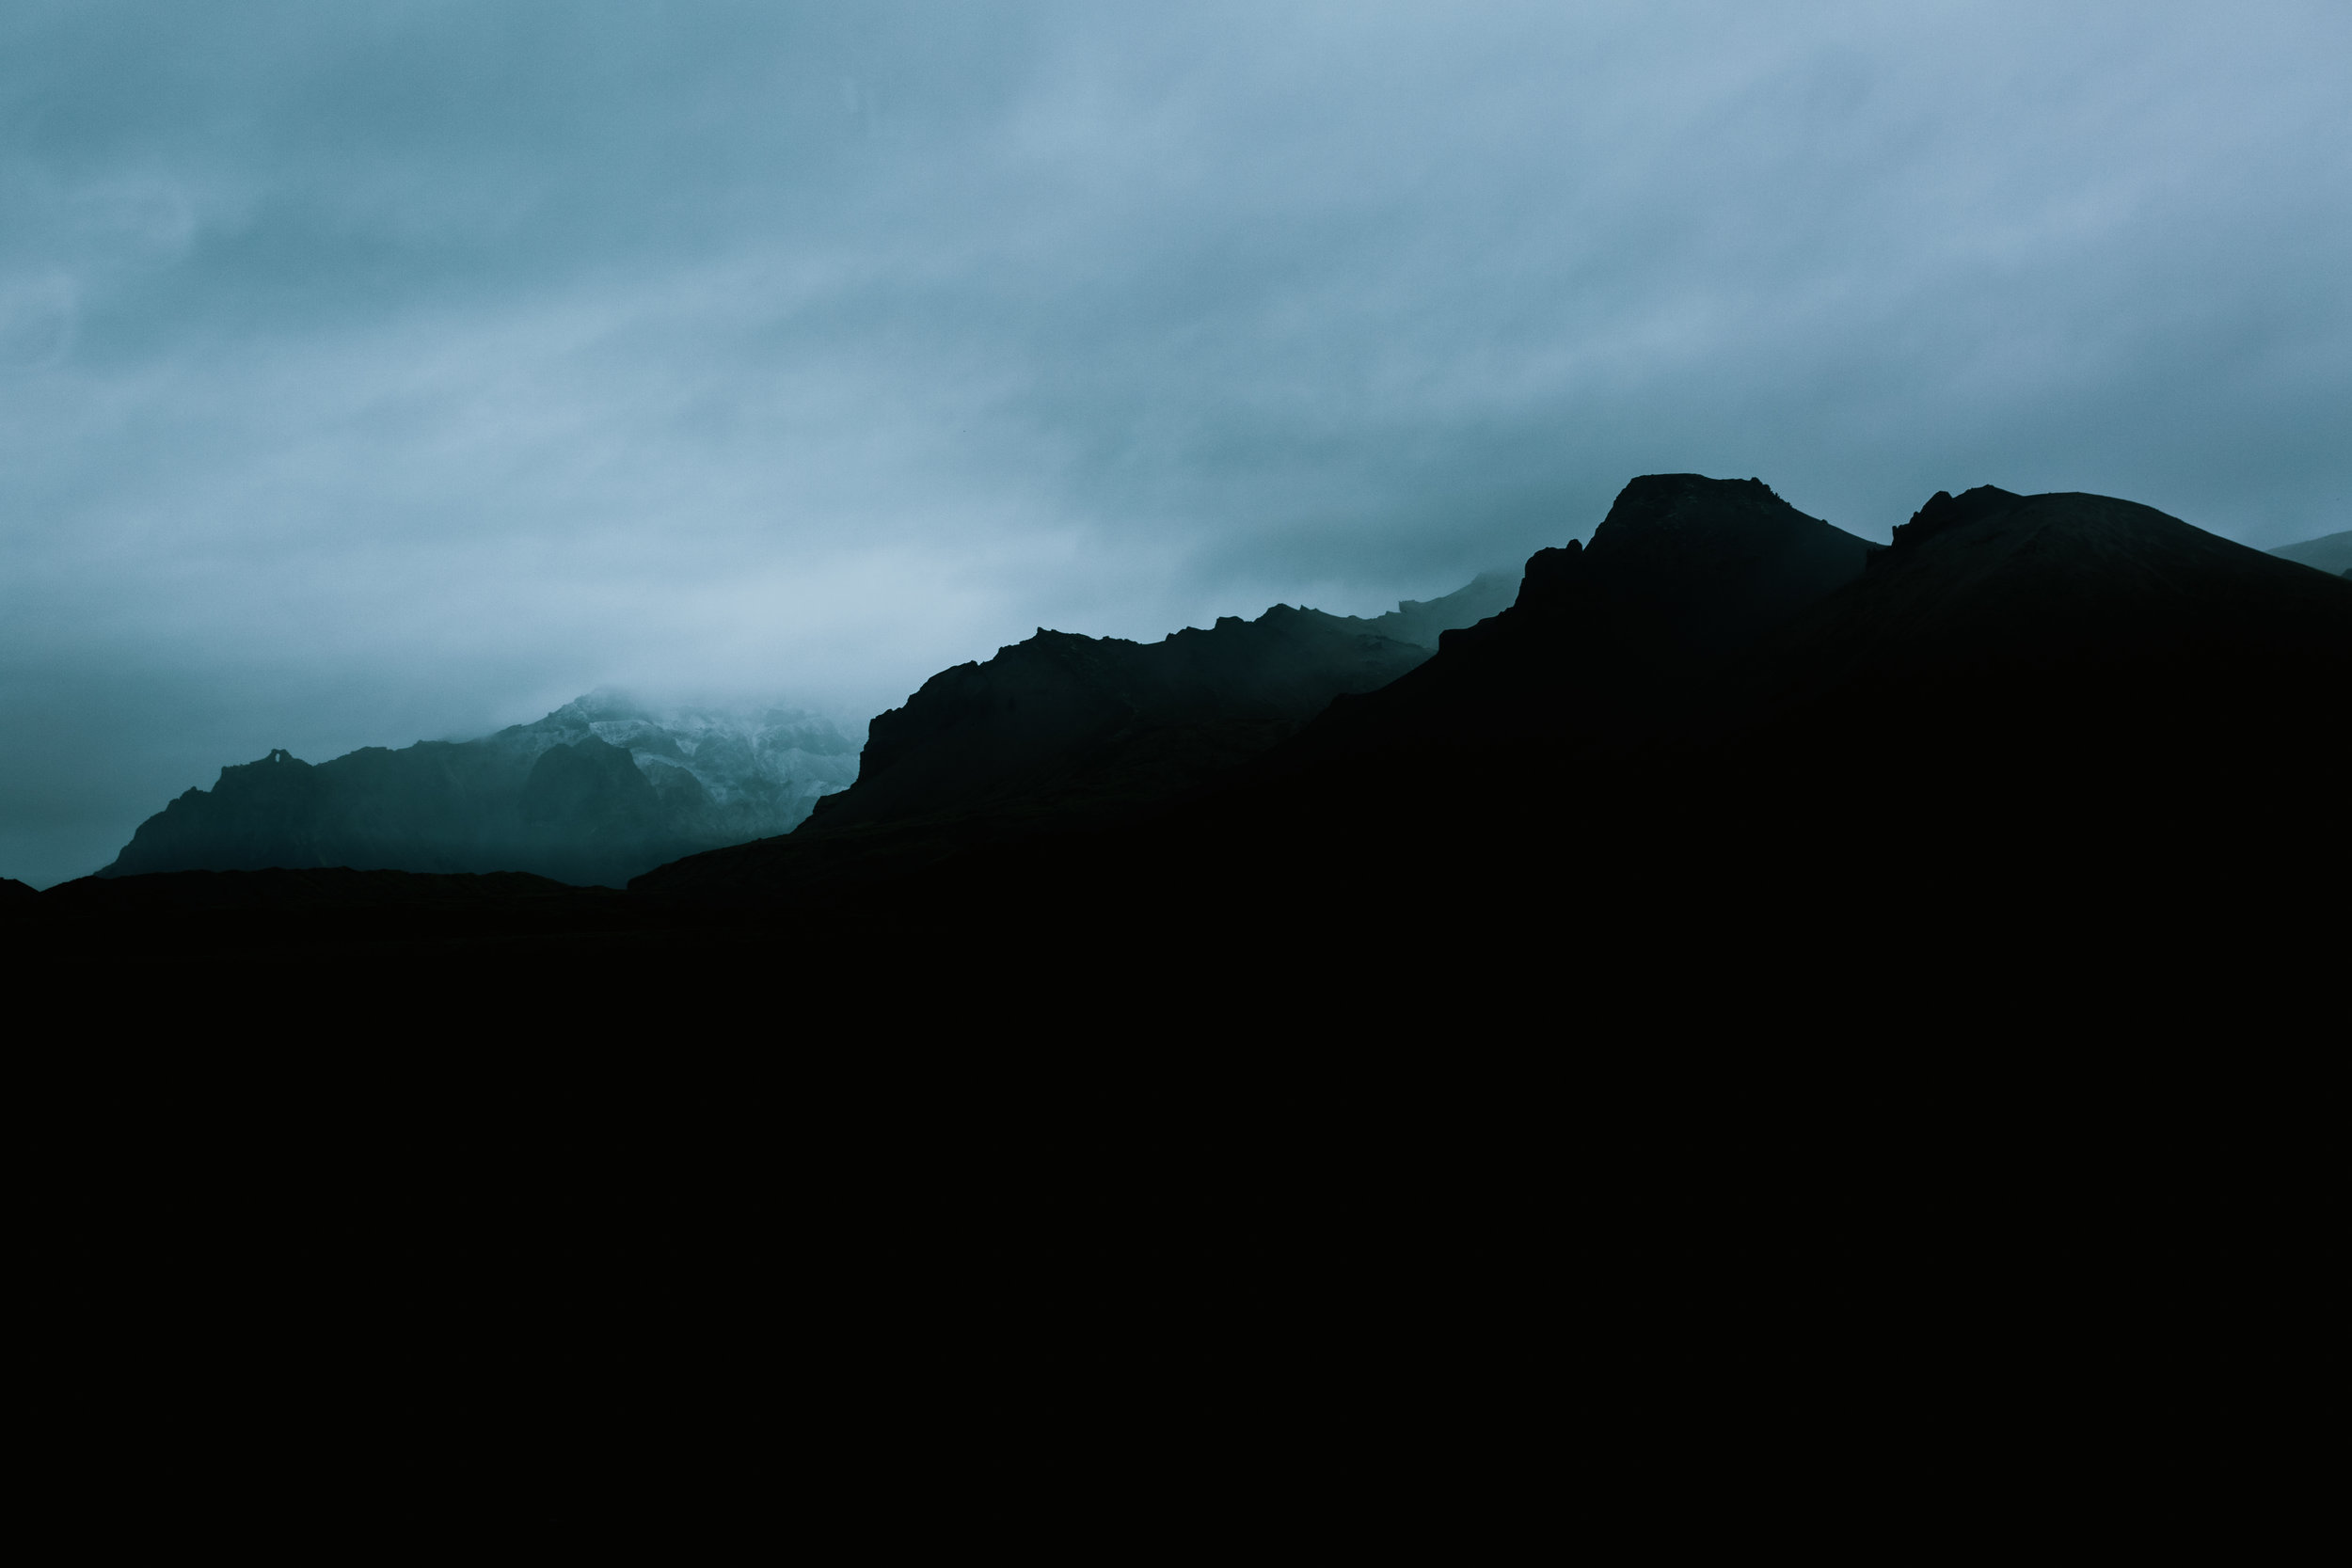 Moody Mist 1